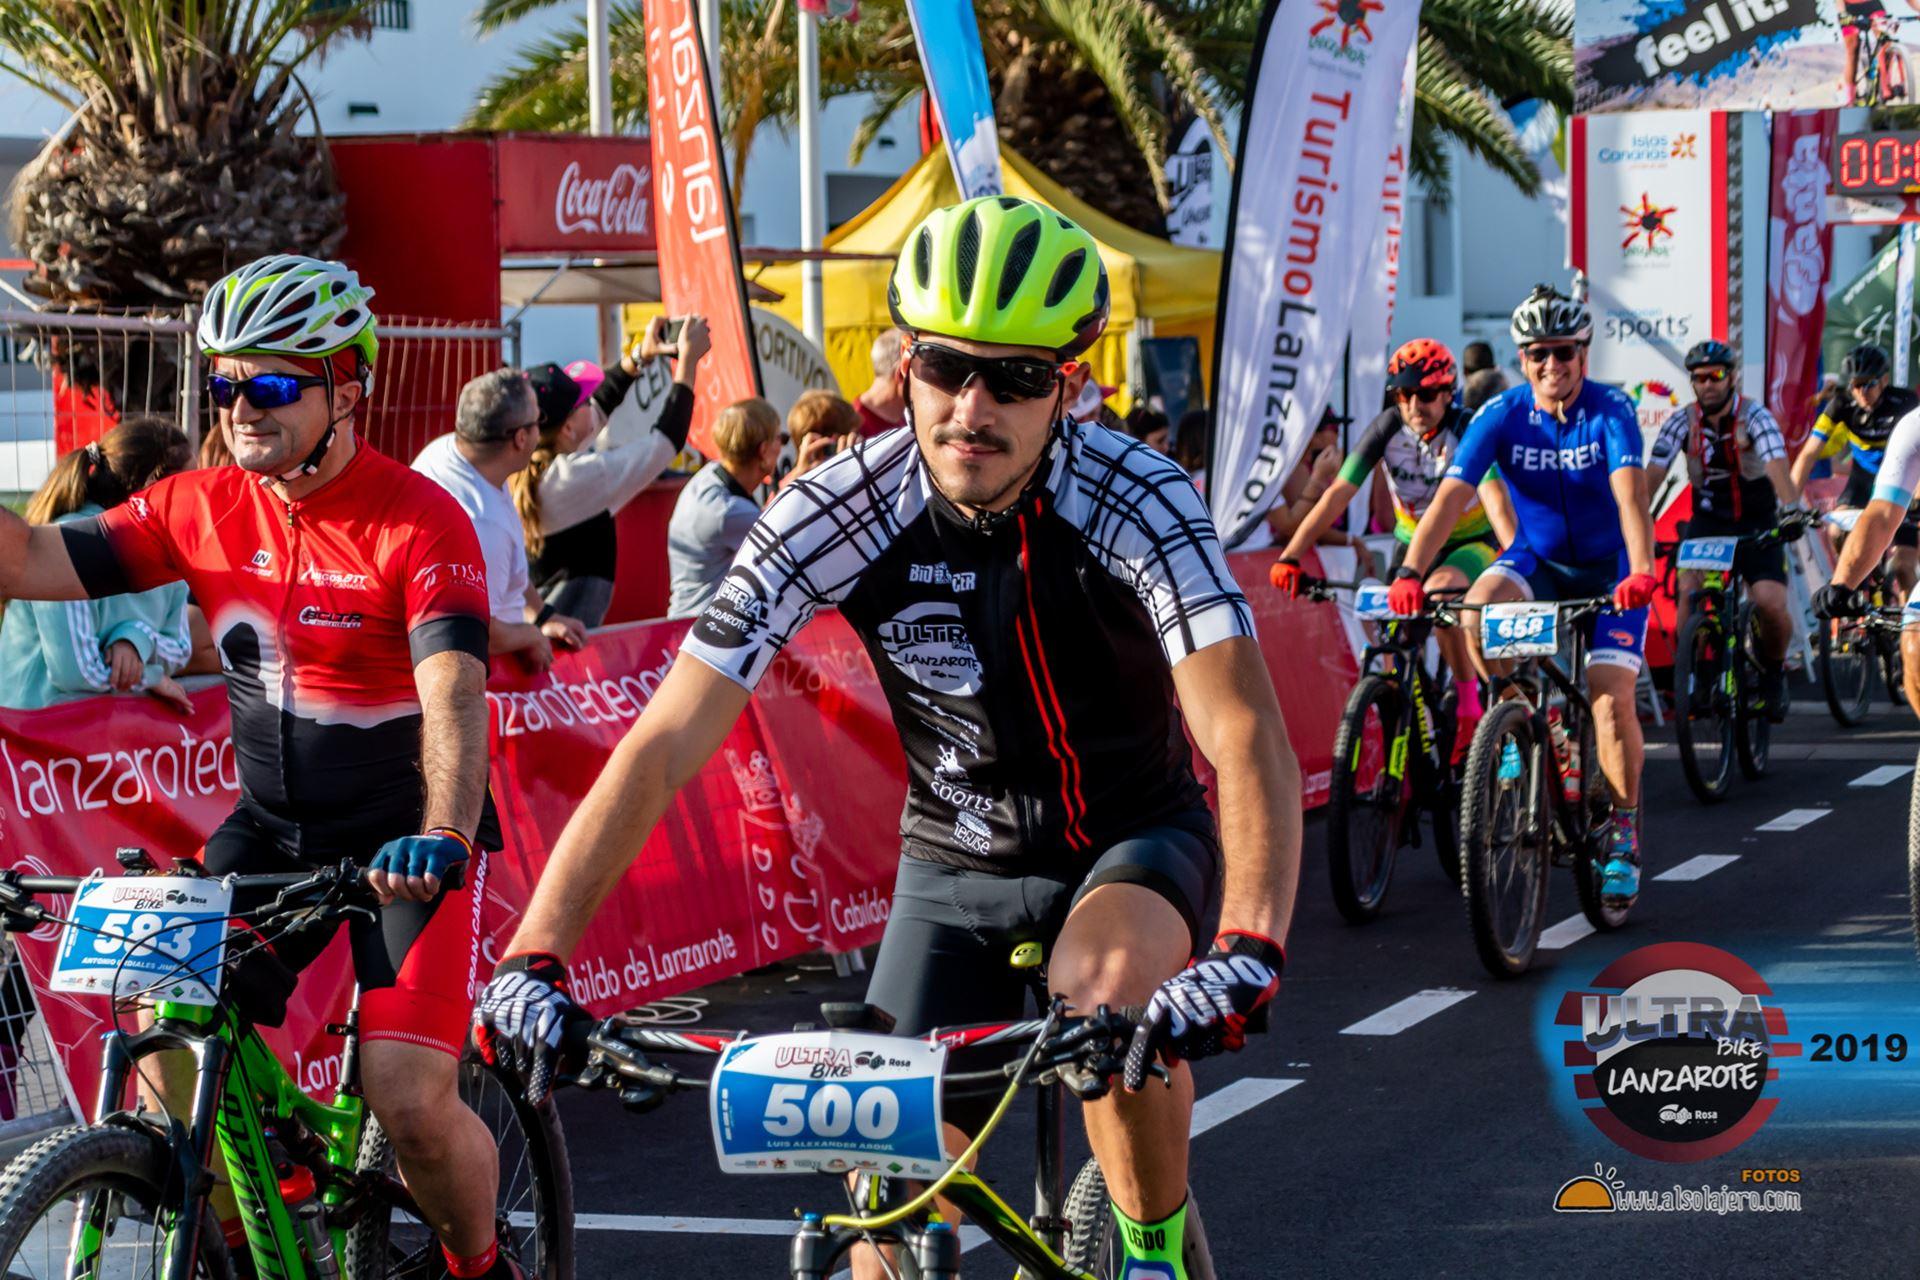 Salida 2ª Etapa Ultrabike 2019 Fotos Alsolajero.com-72